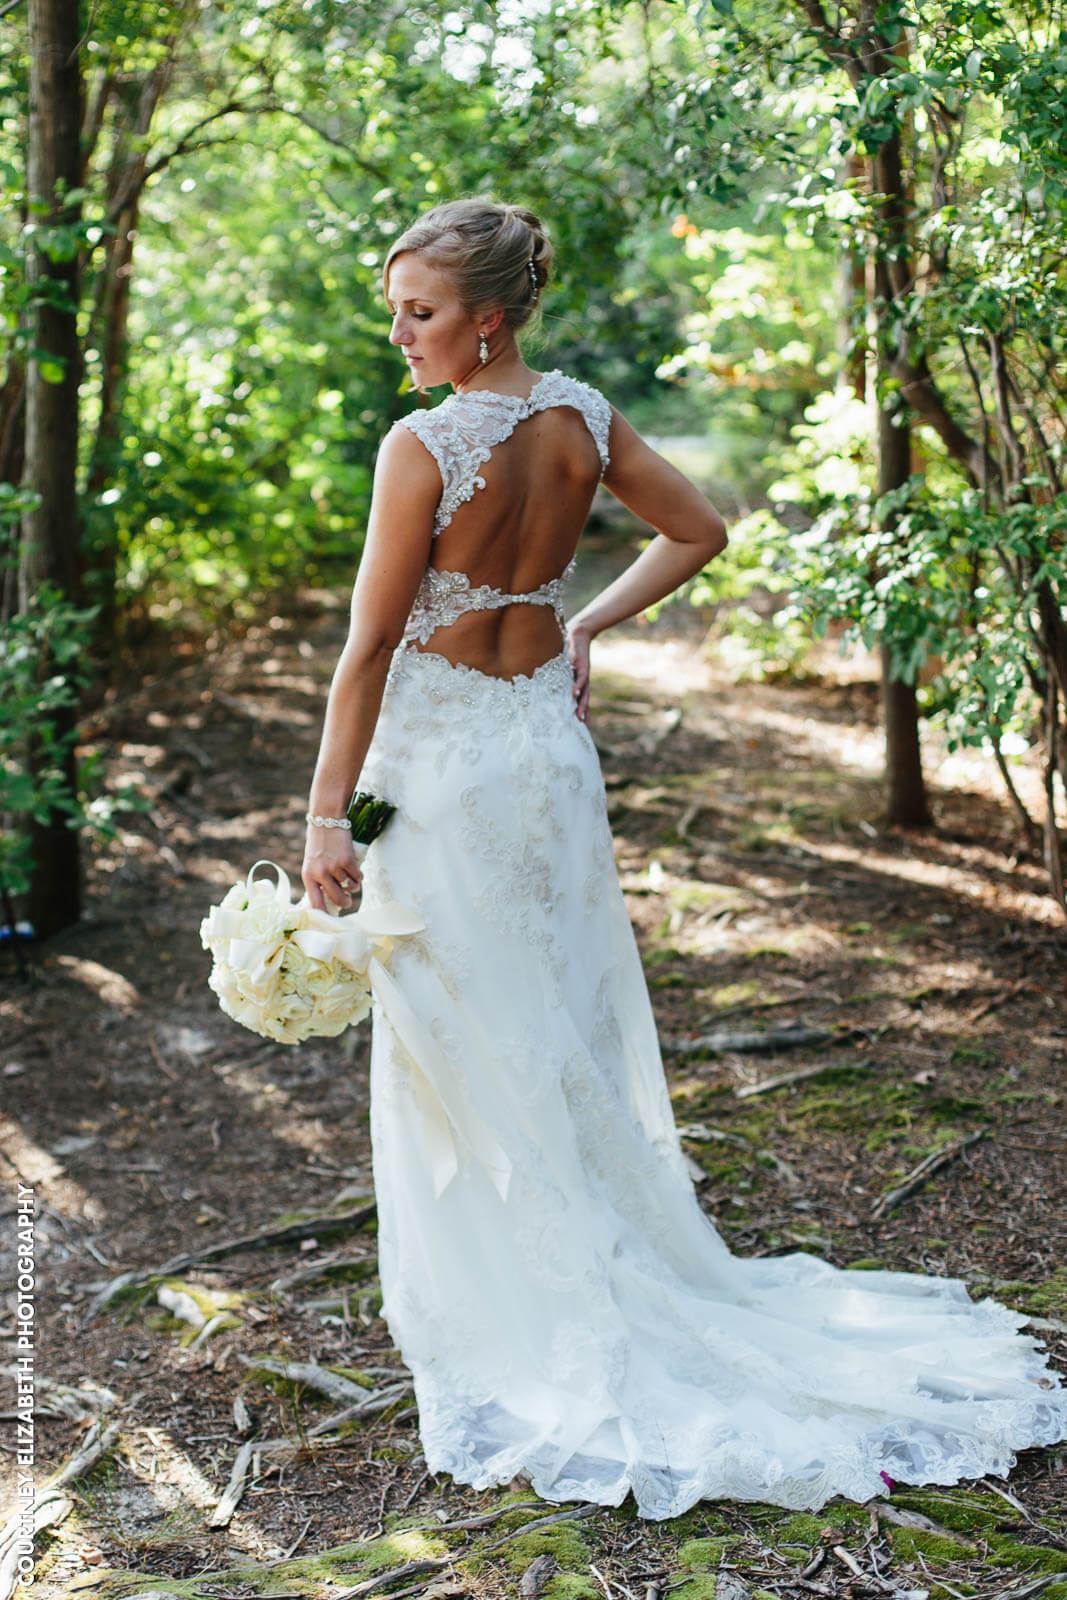 Best Wedding Dress Styles for Summer   Sterling Ballroom, Eatontown NJ